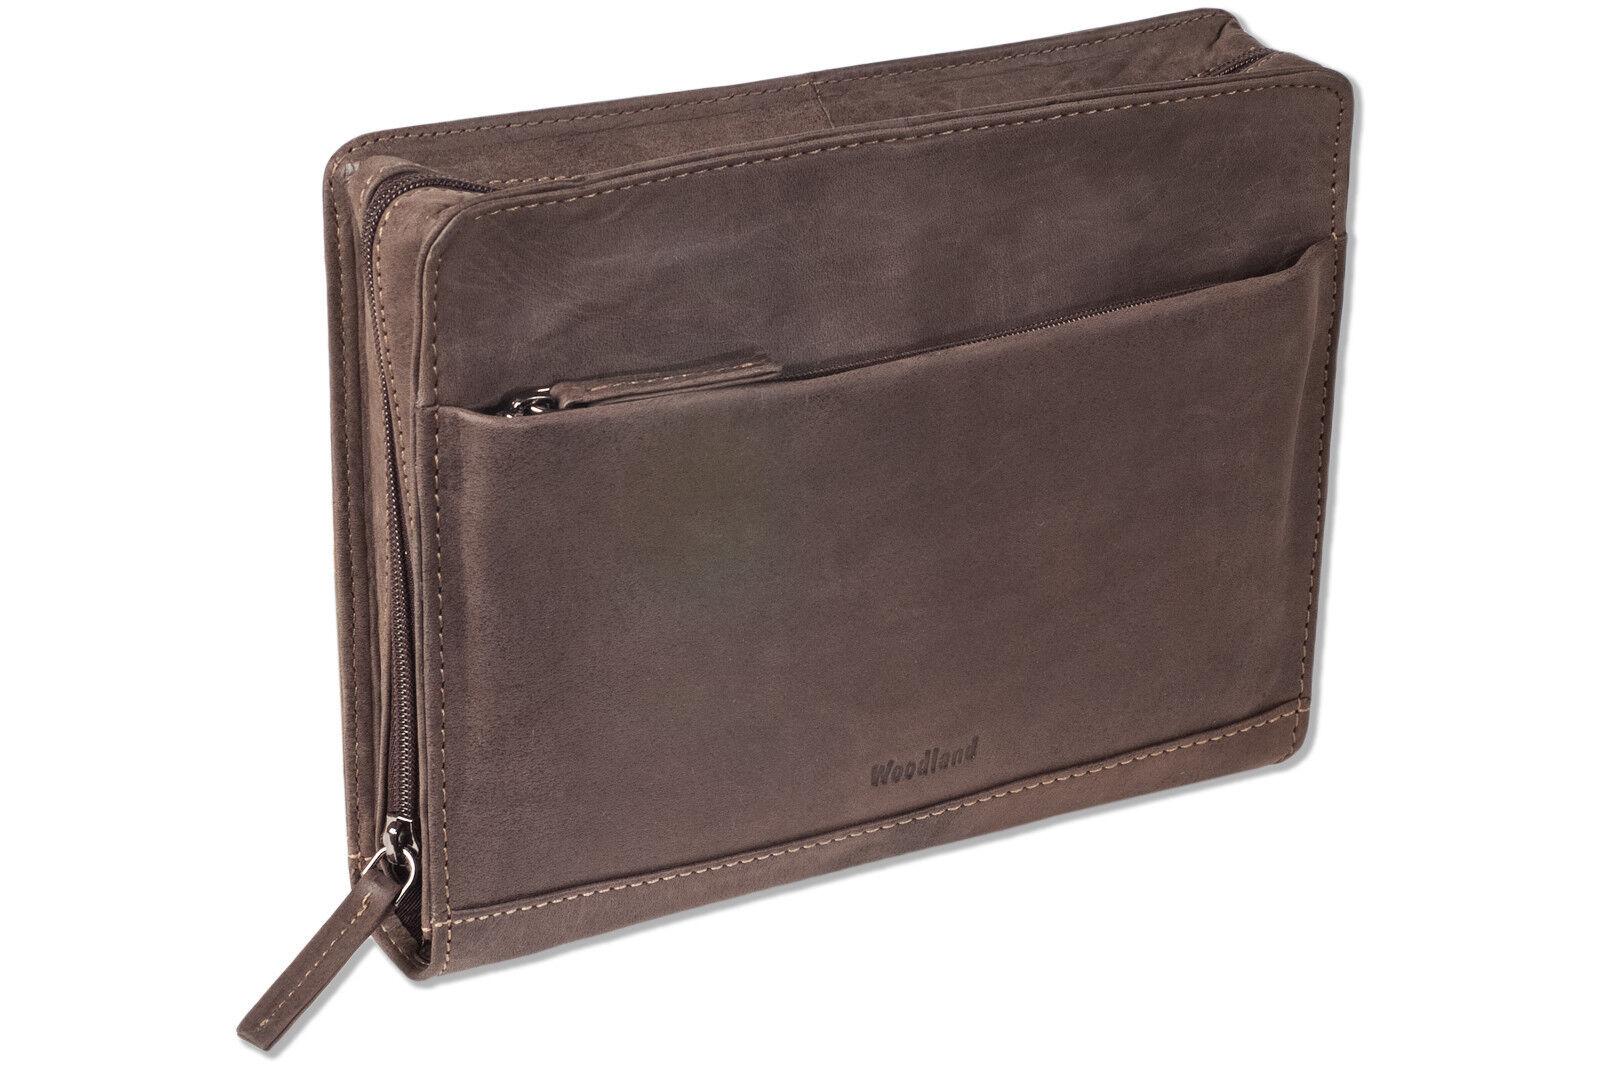 Woodland® Woodland® Woodland® flache Handgelenktasche aus naturbelassenem Leder in Dunkelbraun | Modern  6b05c5